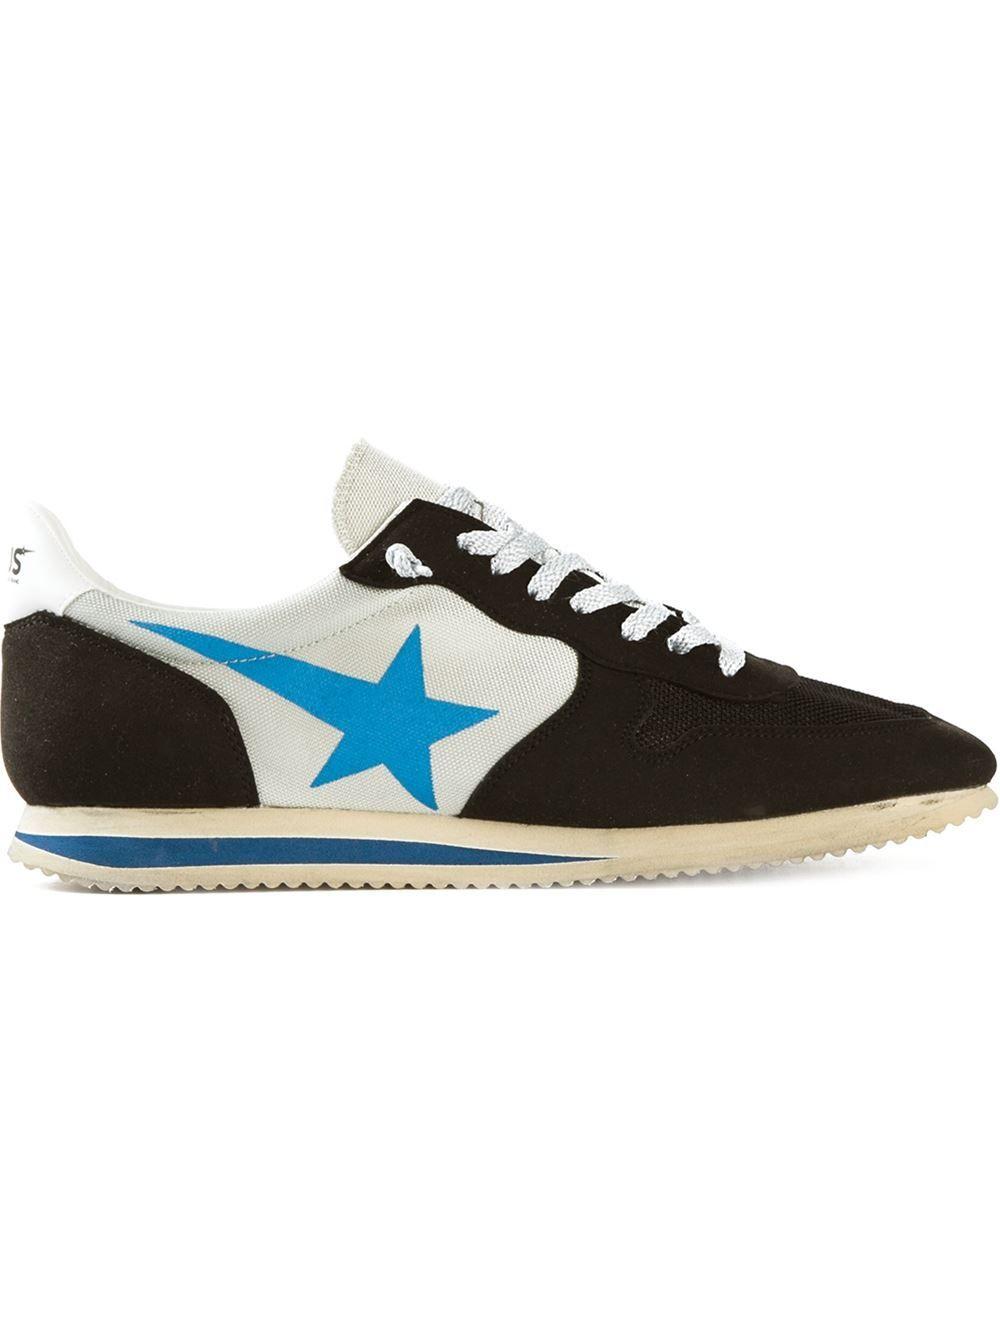 haus #ggdb #sneakers #star #blue #mens